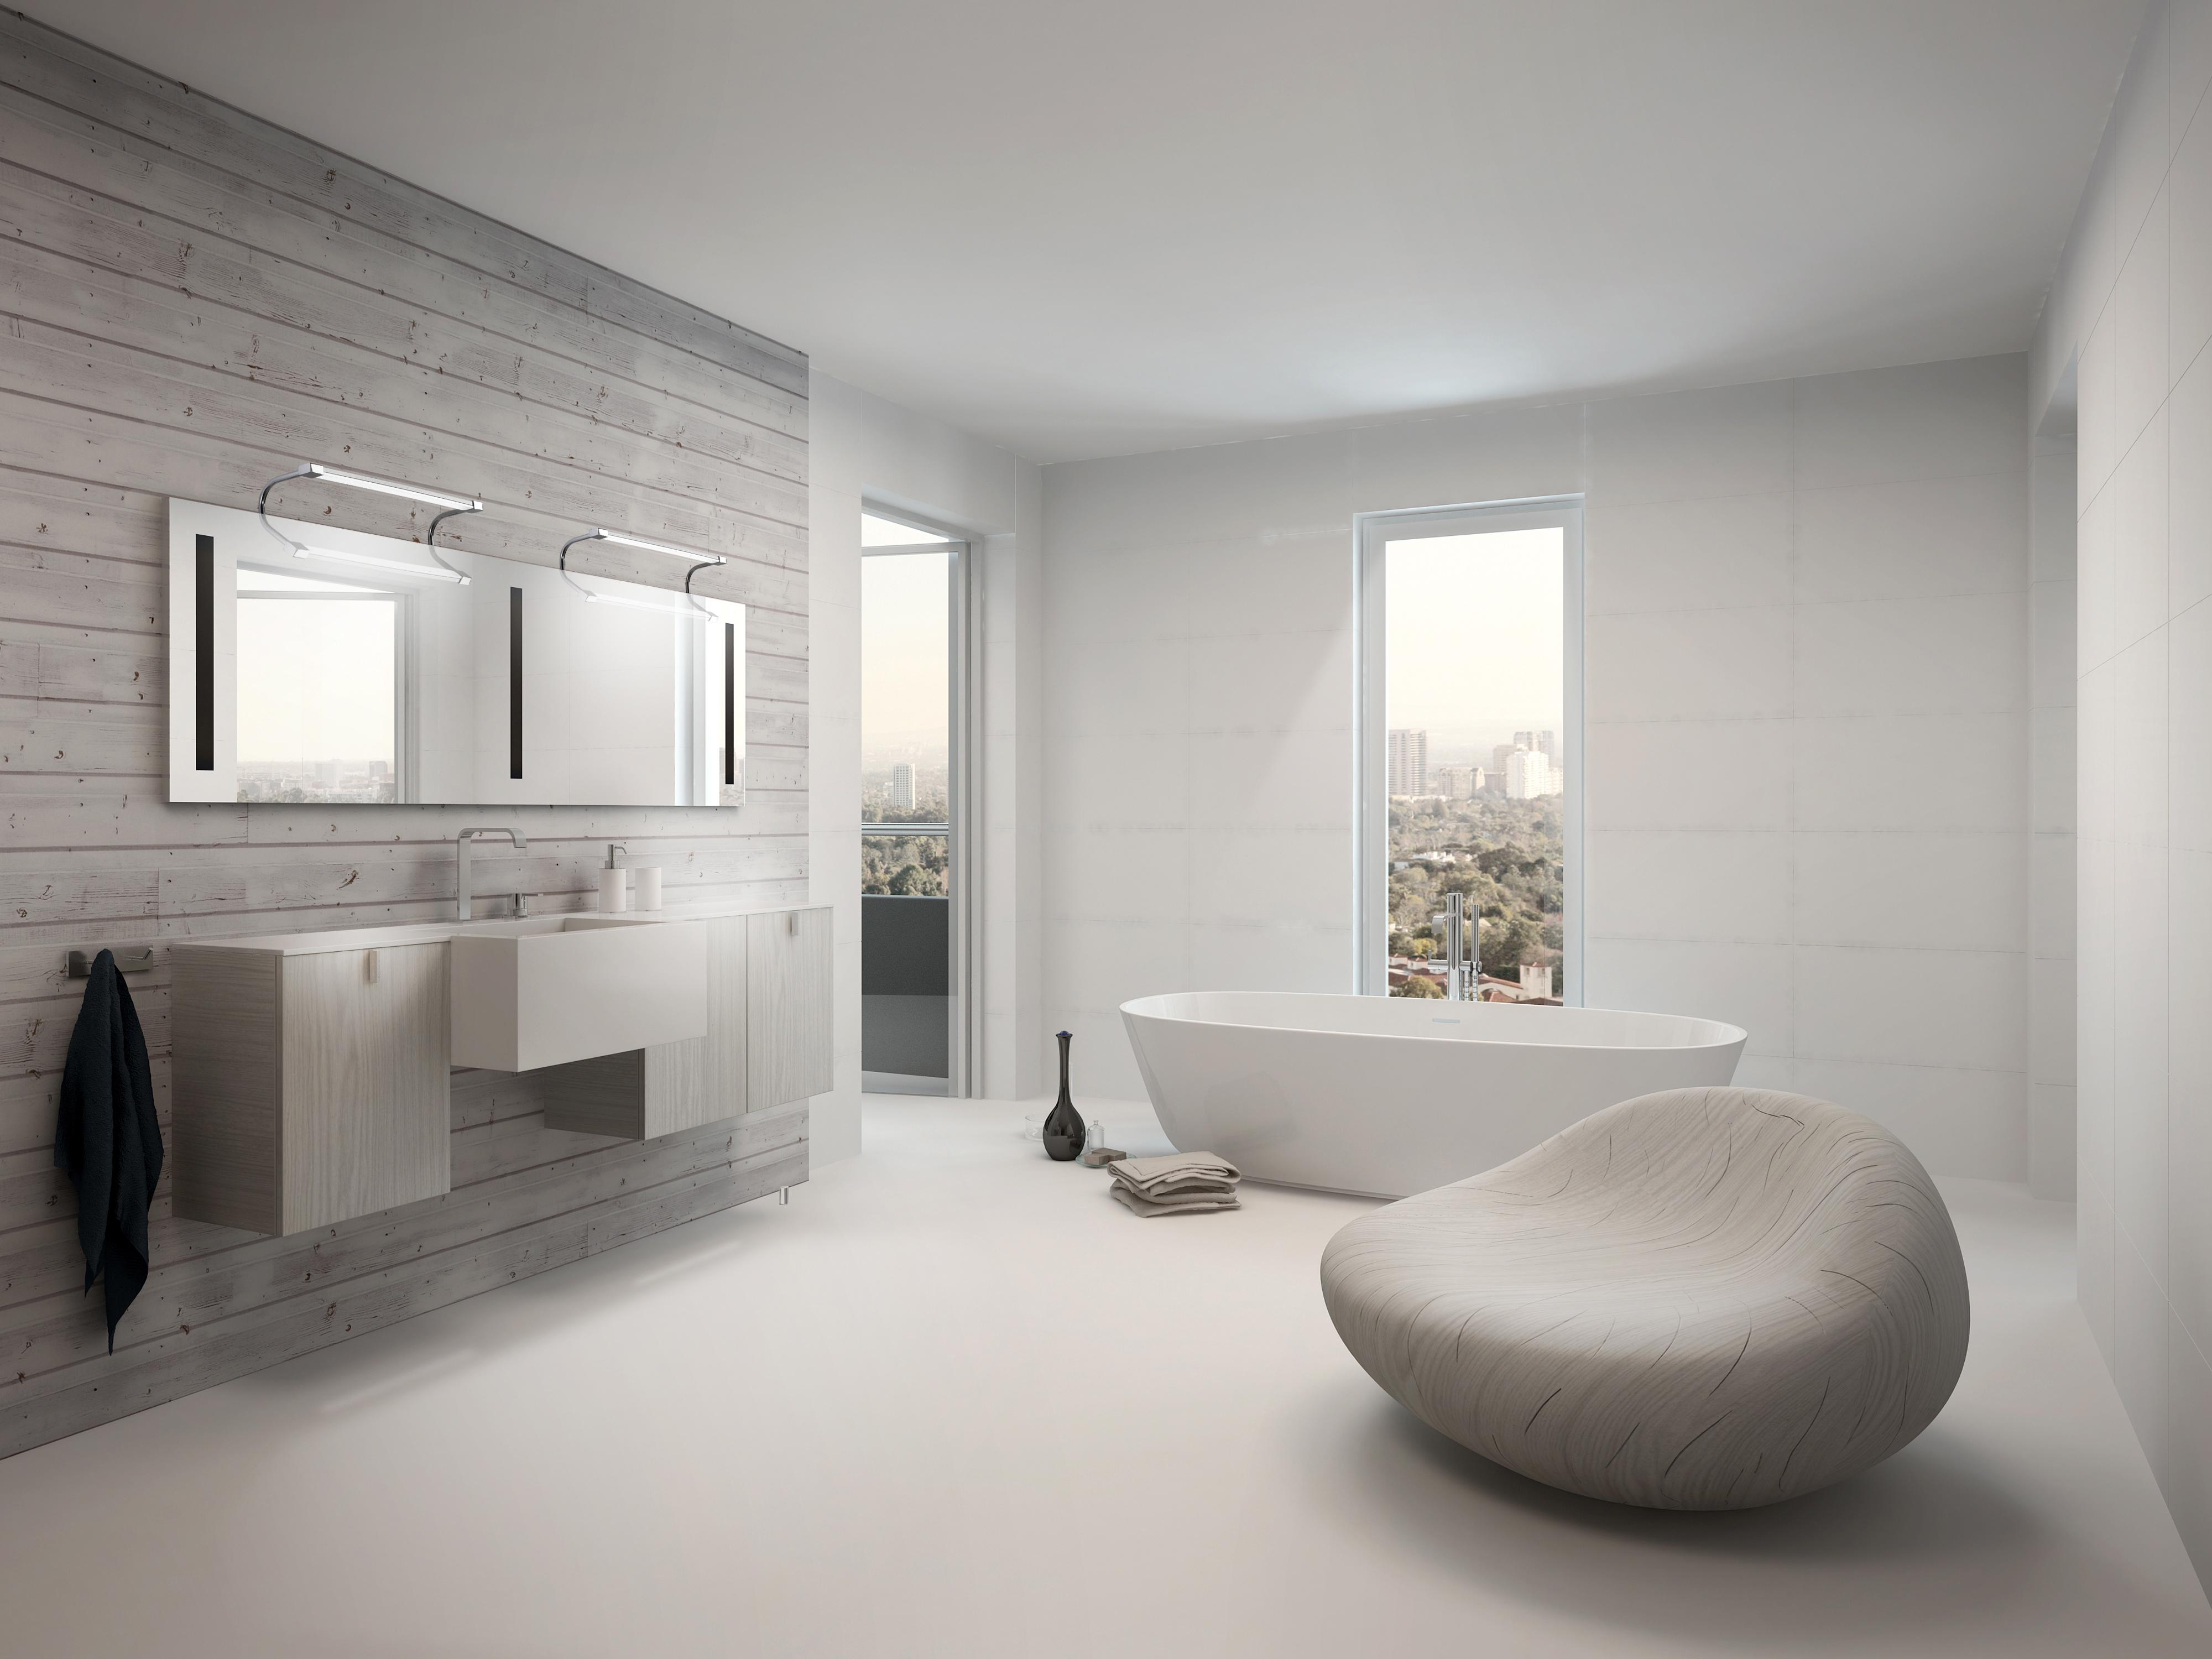 badezimmer led design spiegelleuchte sisley 5086 von mantra. Black Bedroom Furniture Sets. Home Design Ideas